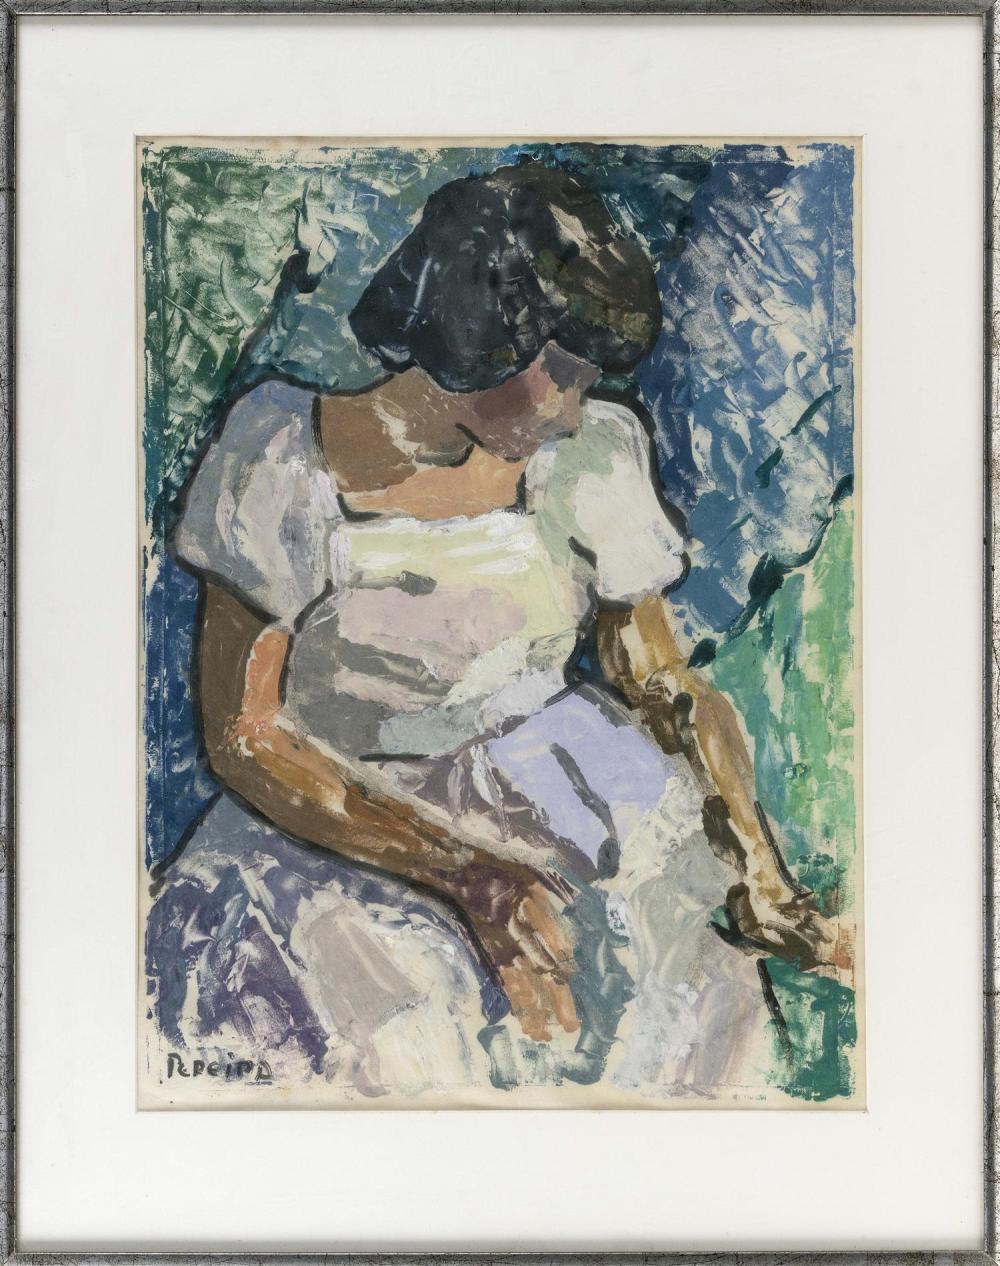 "JOAN PEREIRA, Massachusetts/Pennsylvania, b. 1933, Portrait of woman in white., Mixed media on paper, 24"" x 18"" sight. Framed 33"" x..."